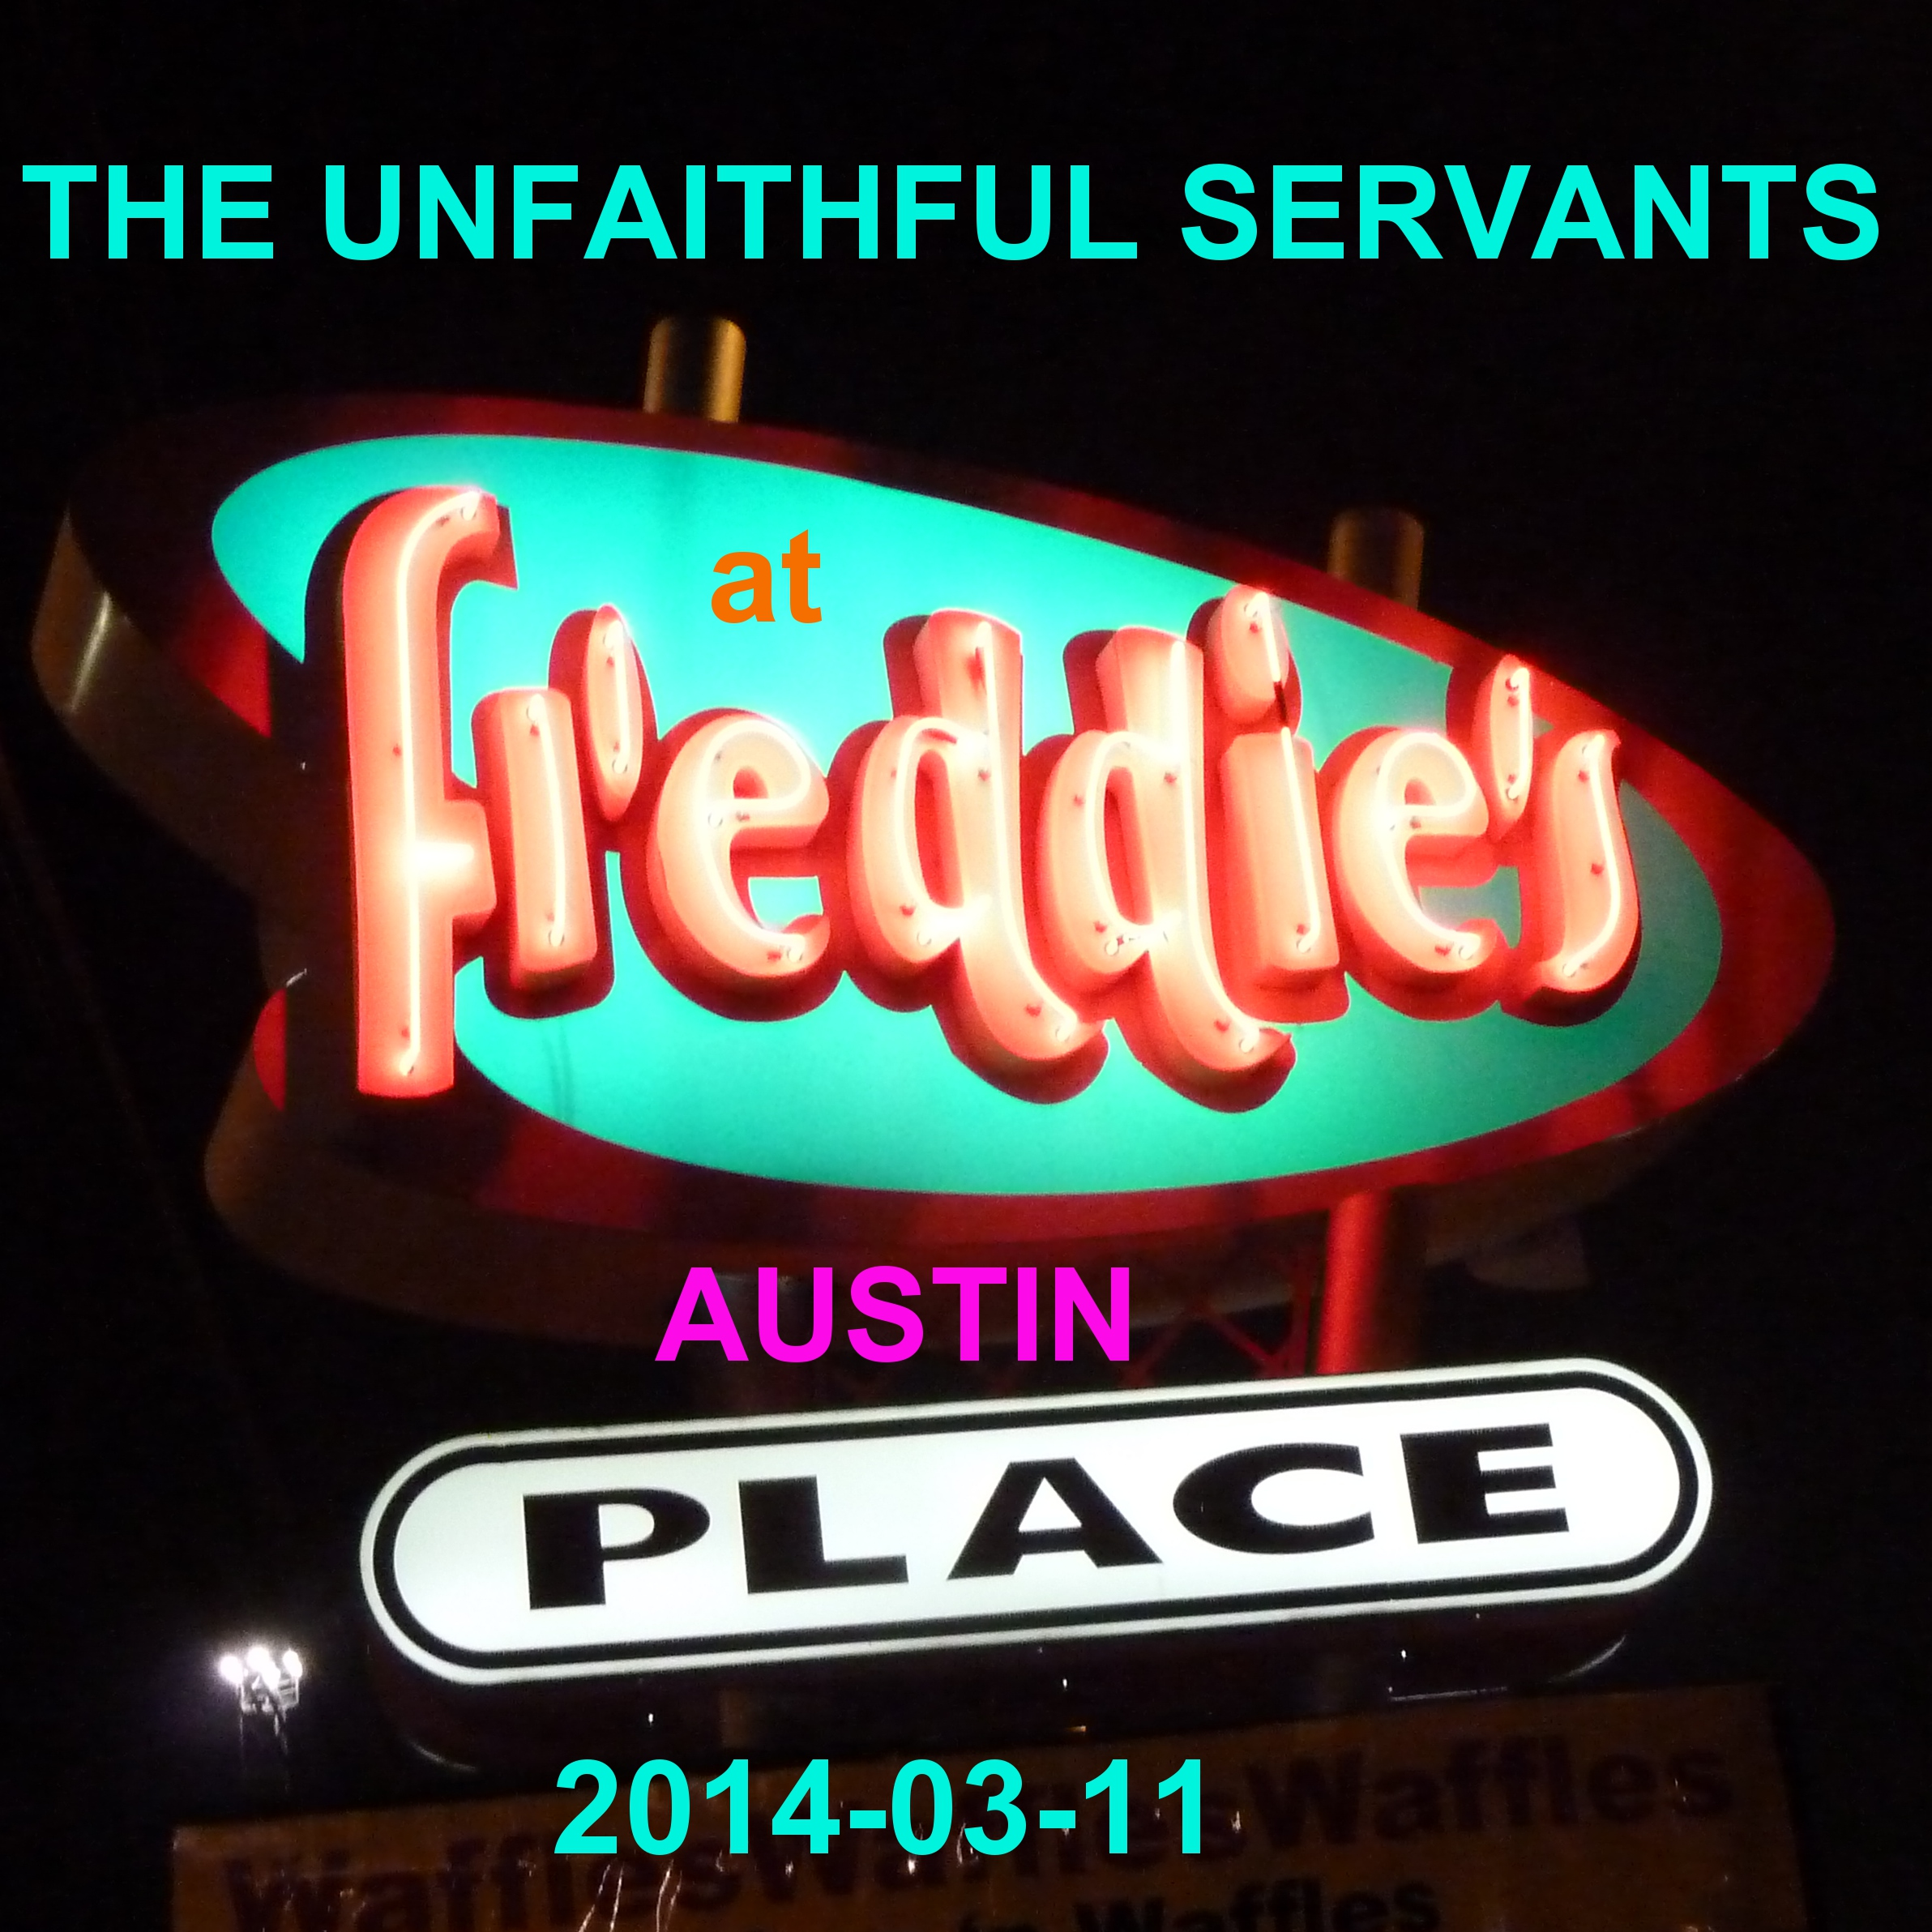 UnfaithfulServants2014-03-11FreddiesAustinTX.jpg